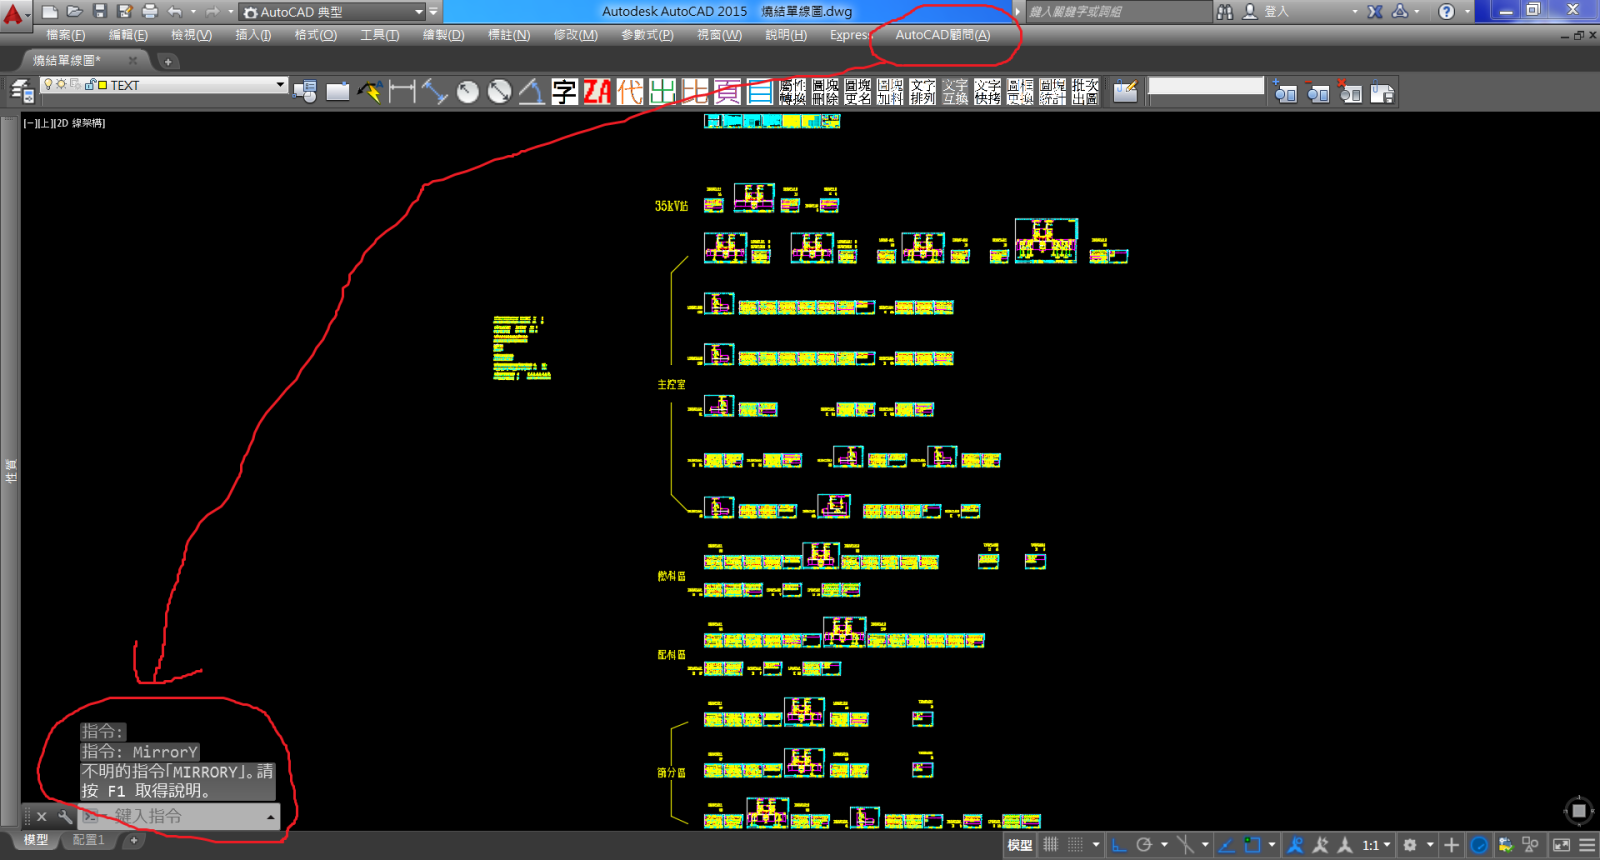 ACADAdviser外掛程式 - 主程式安裝步驟 Fly73p